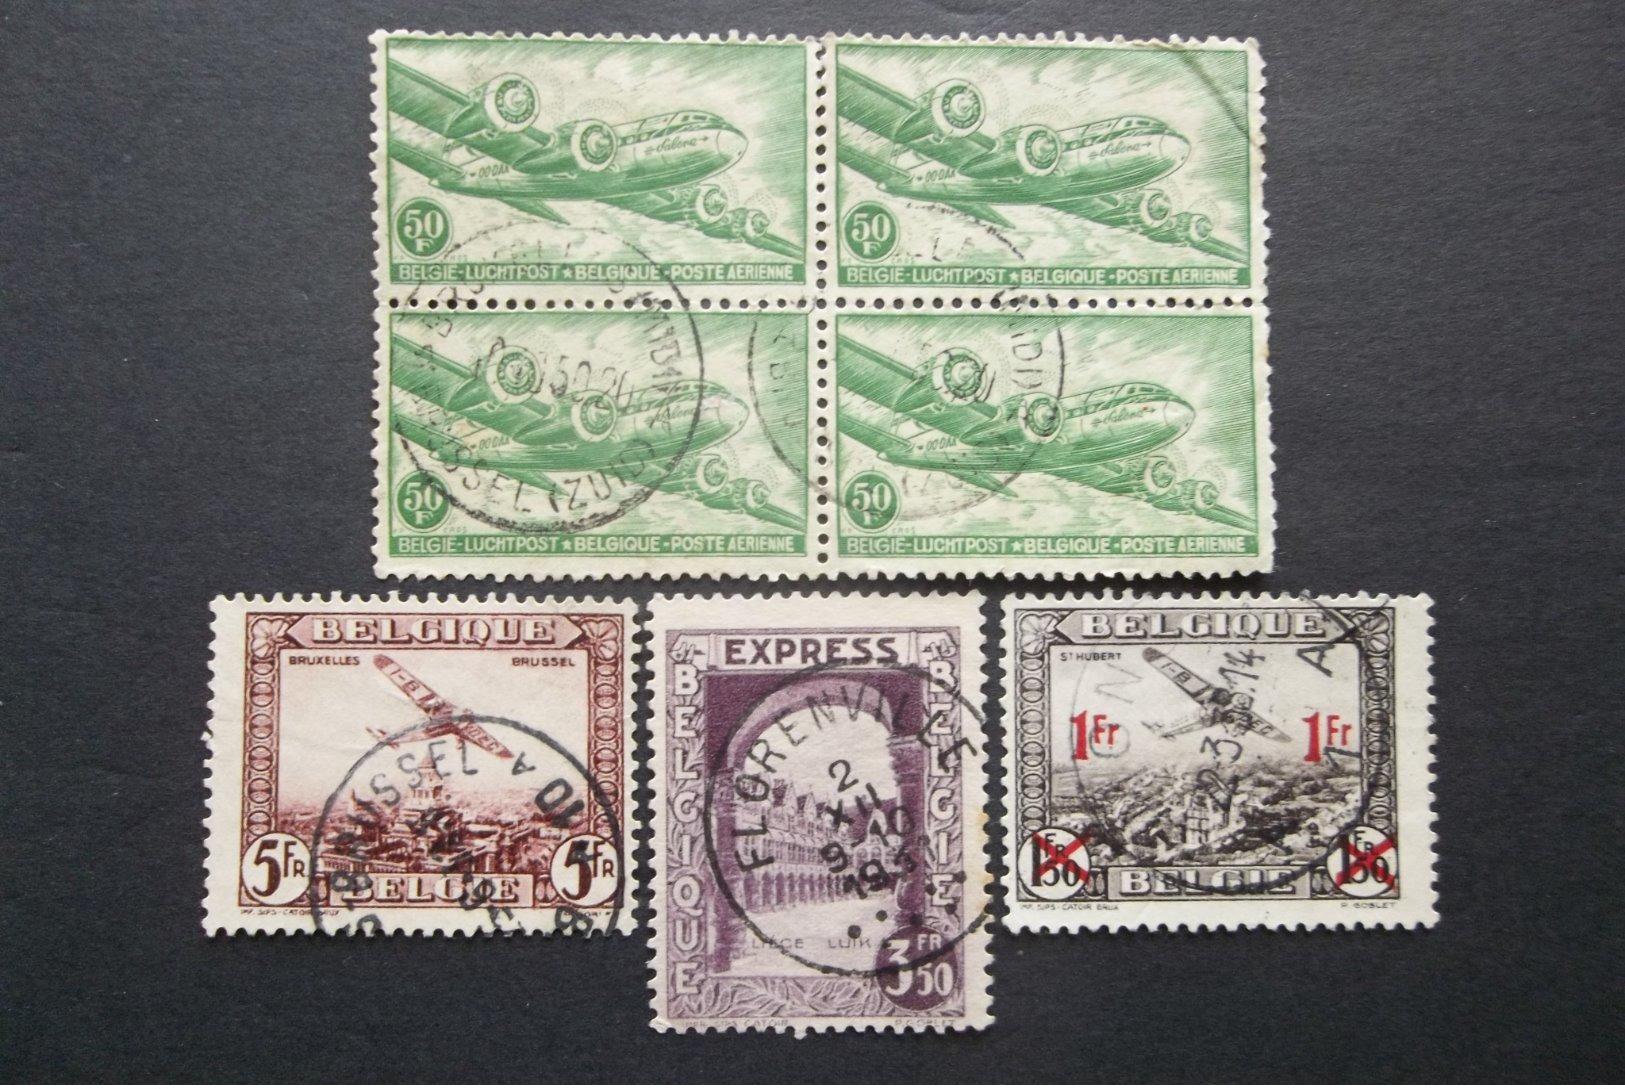 Belgique-Belgie: Various Stamps In Used (#GU7) - Unclassified